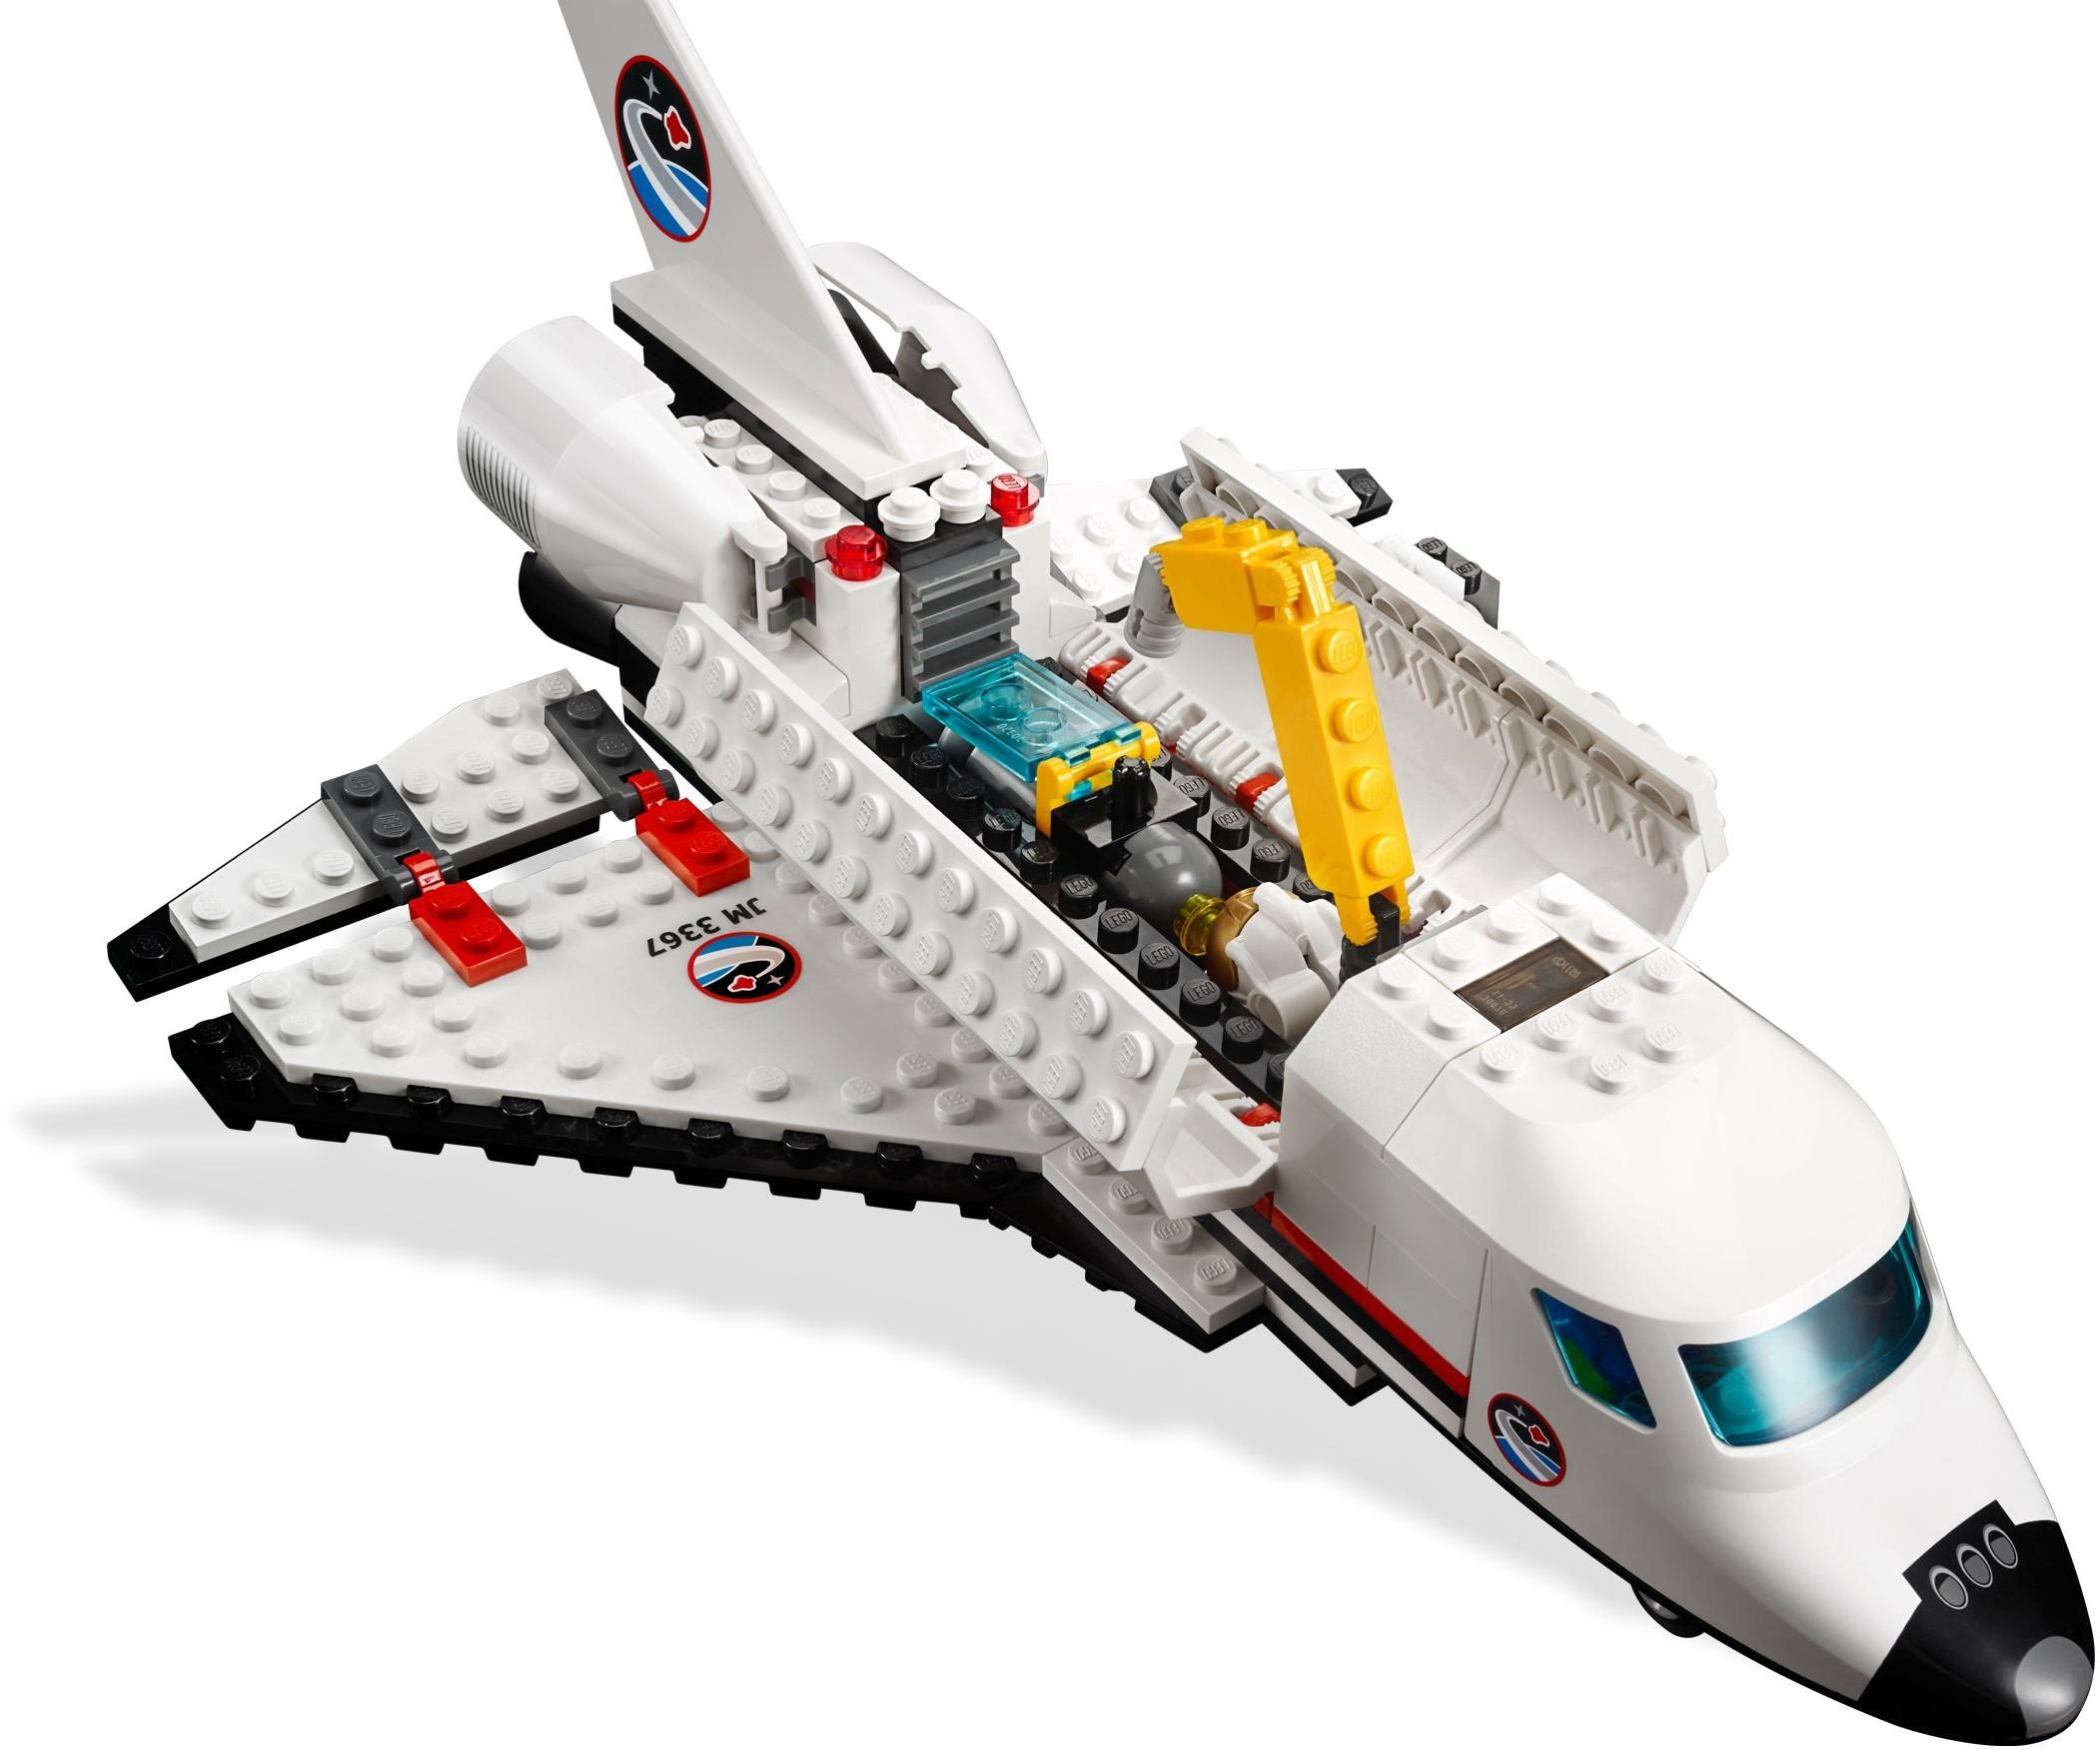 lego space shuttle orbiter - photo #35